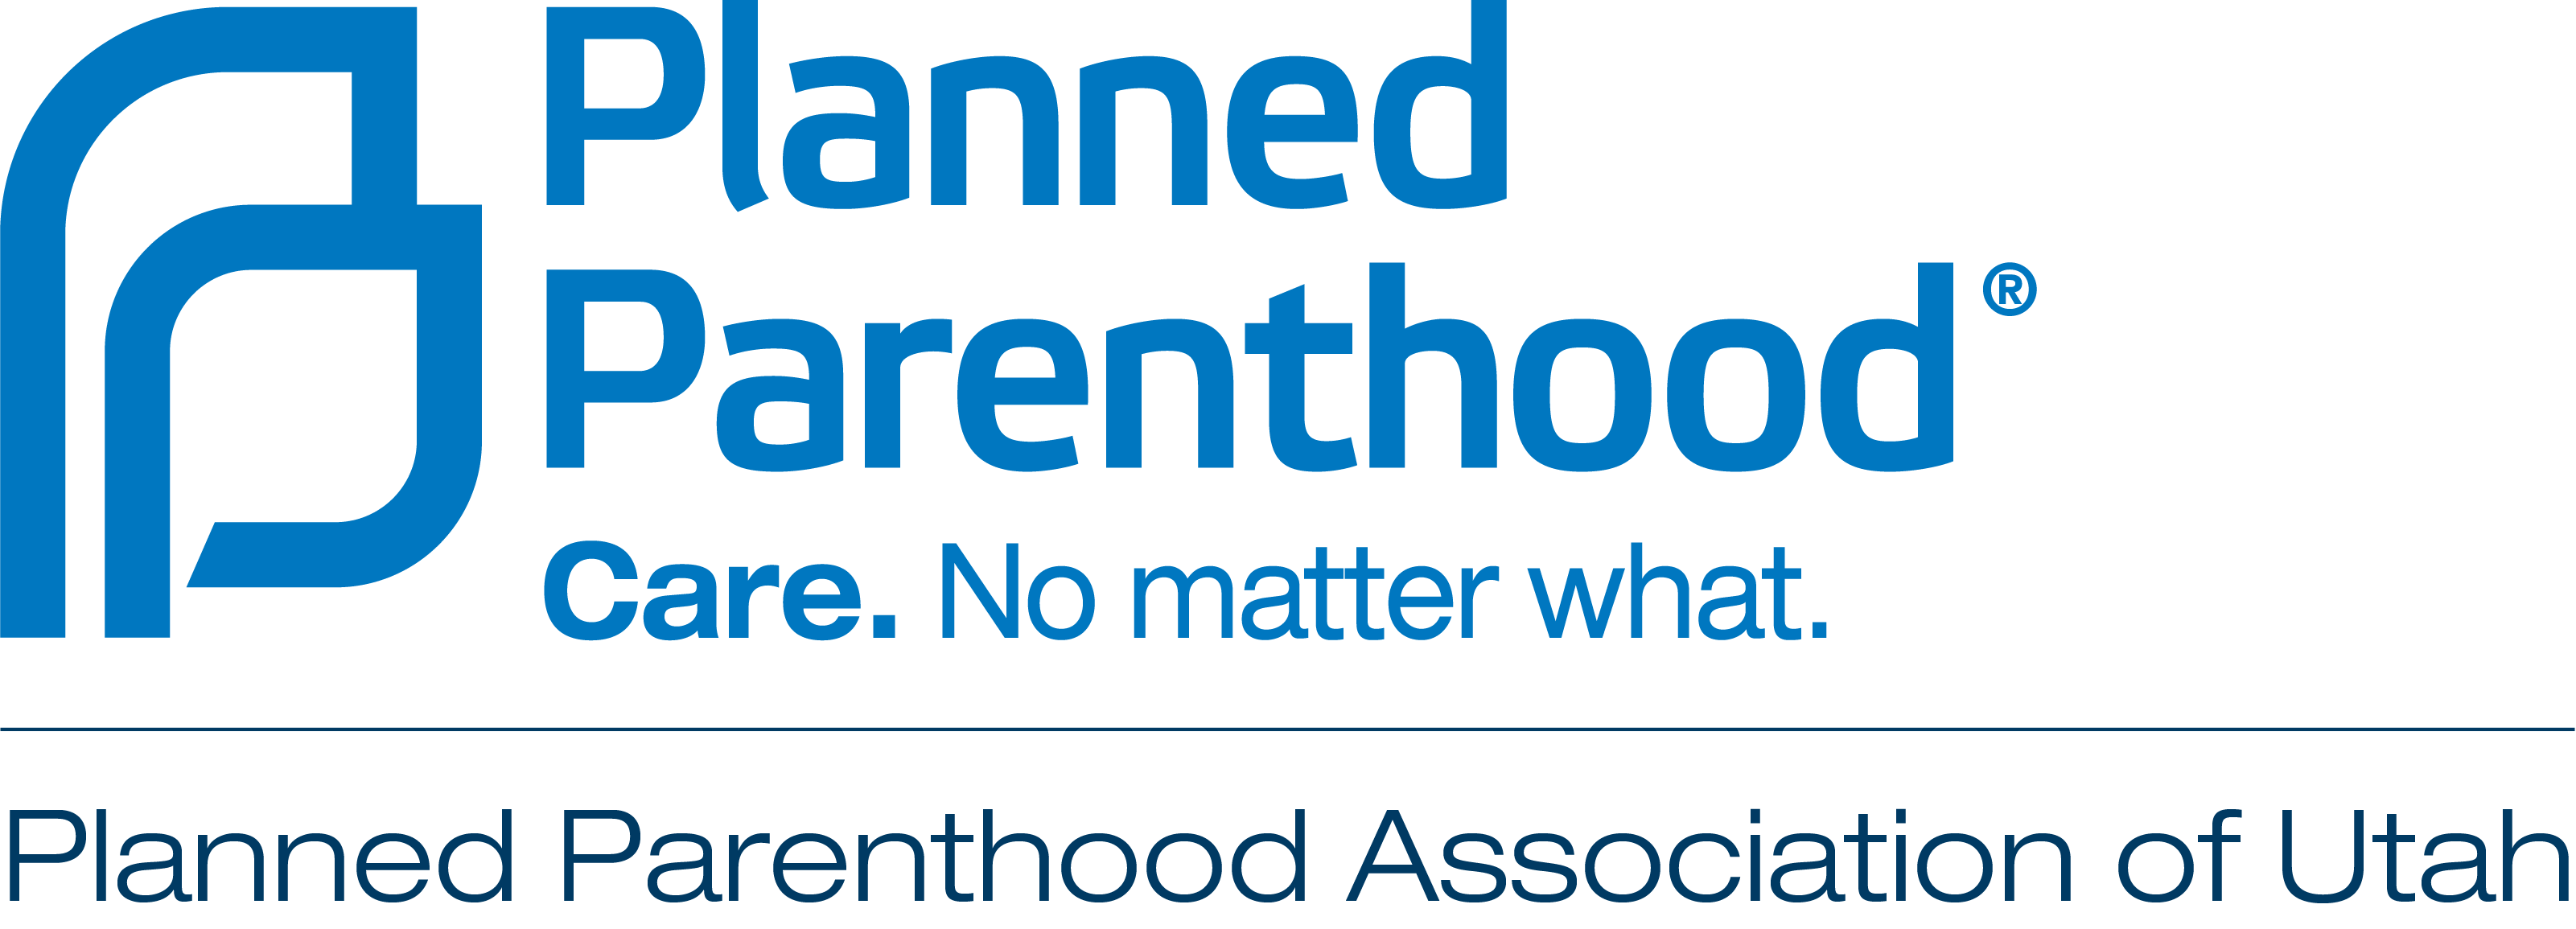 Planned Parenthood Association of Utah logo